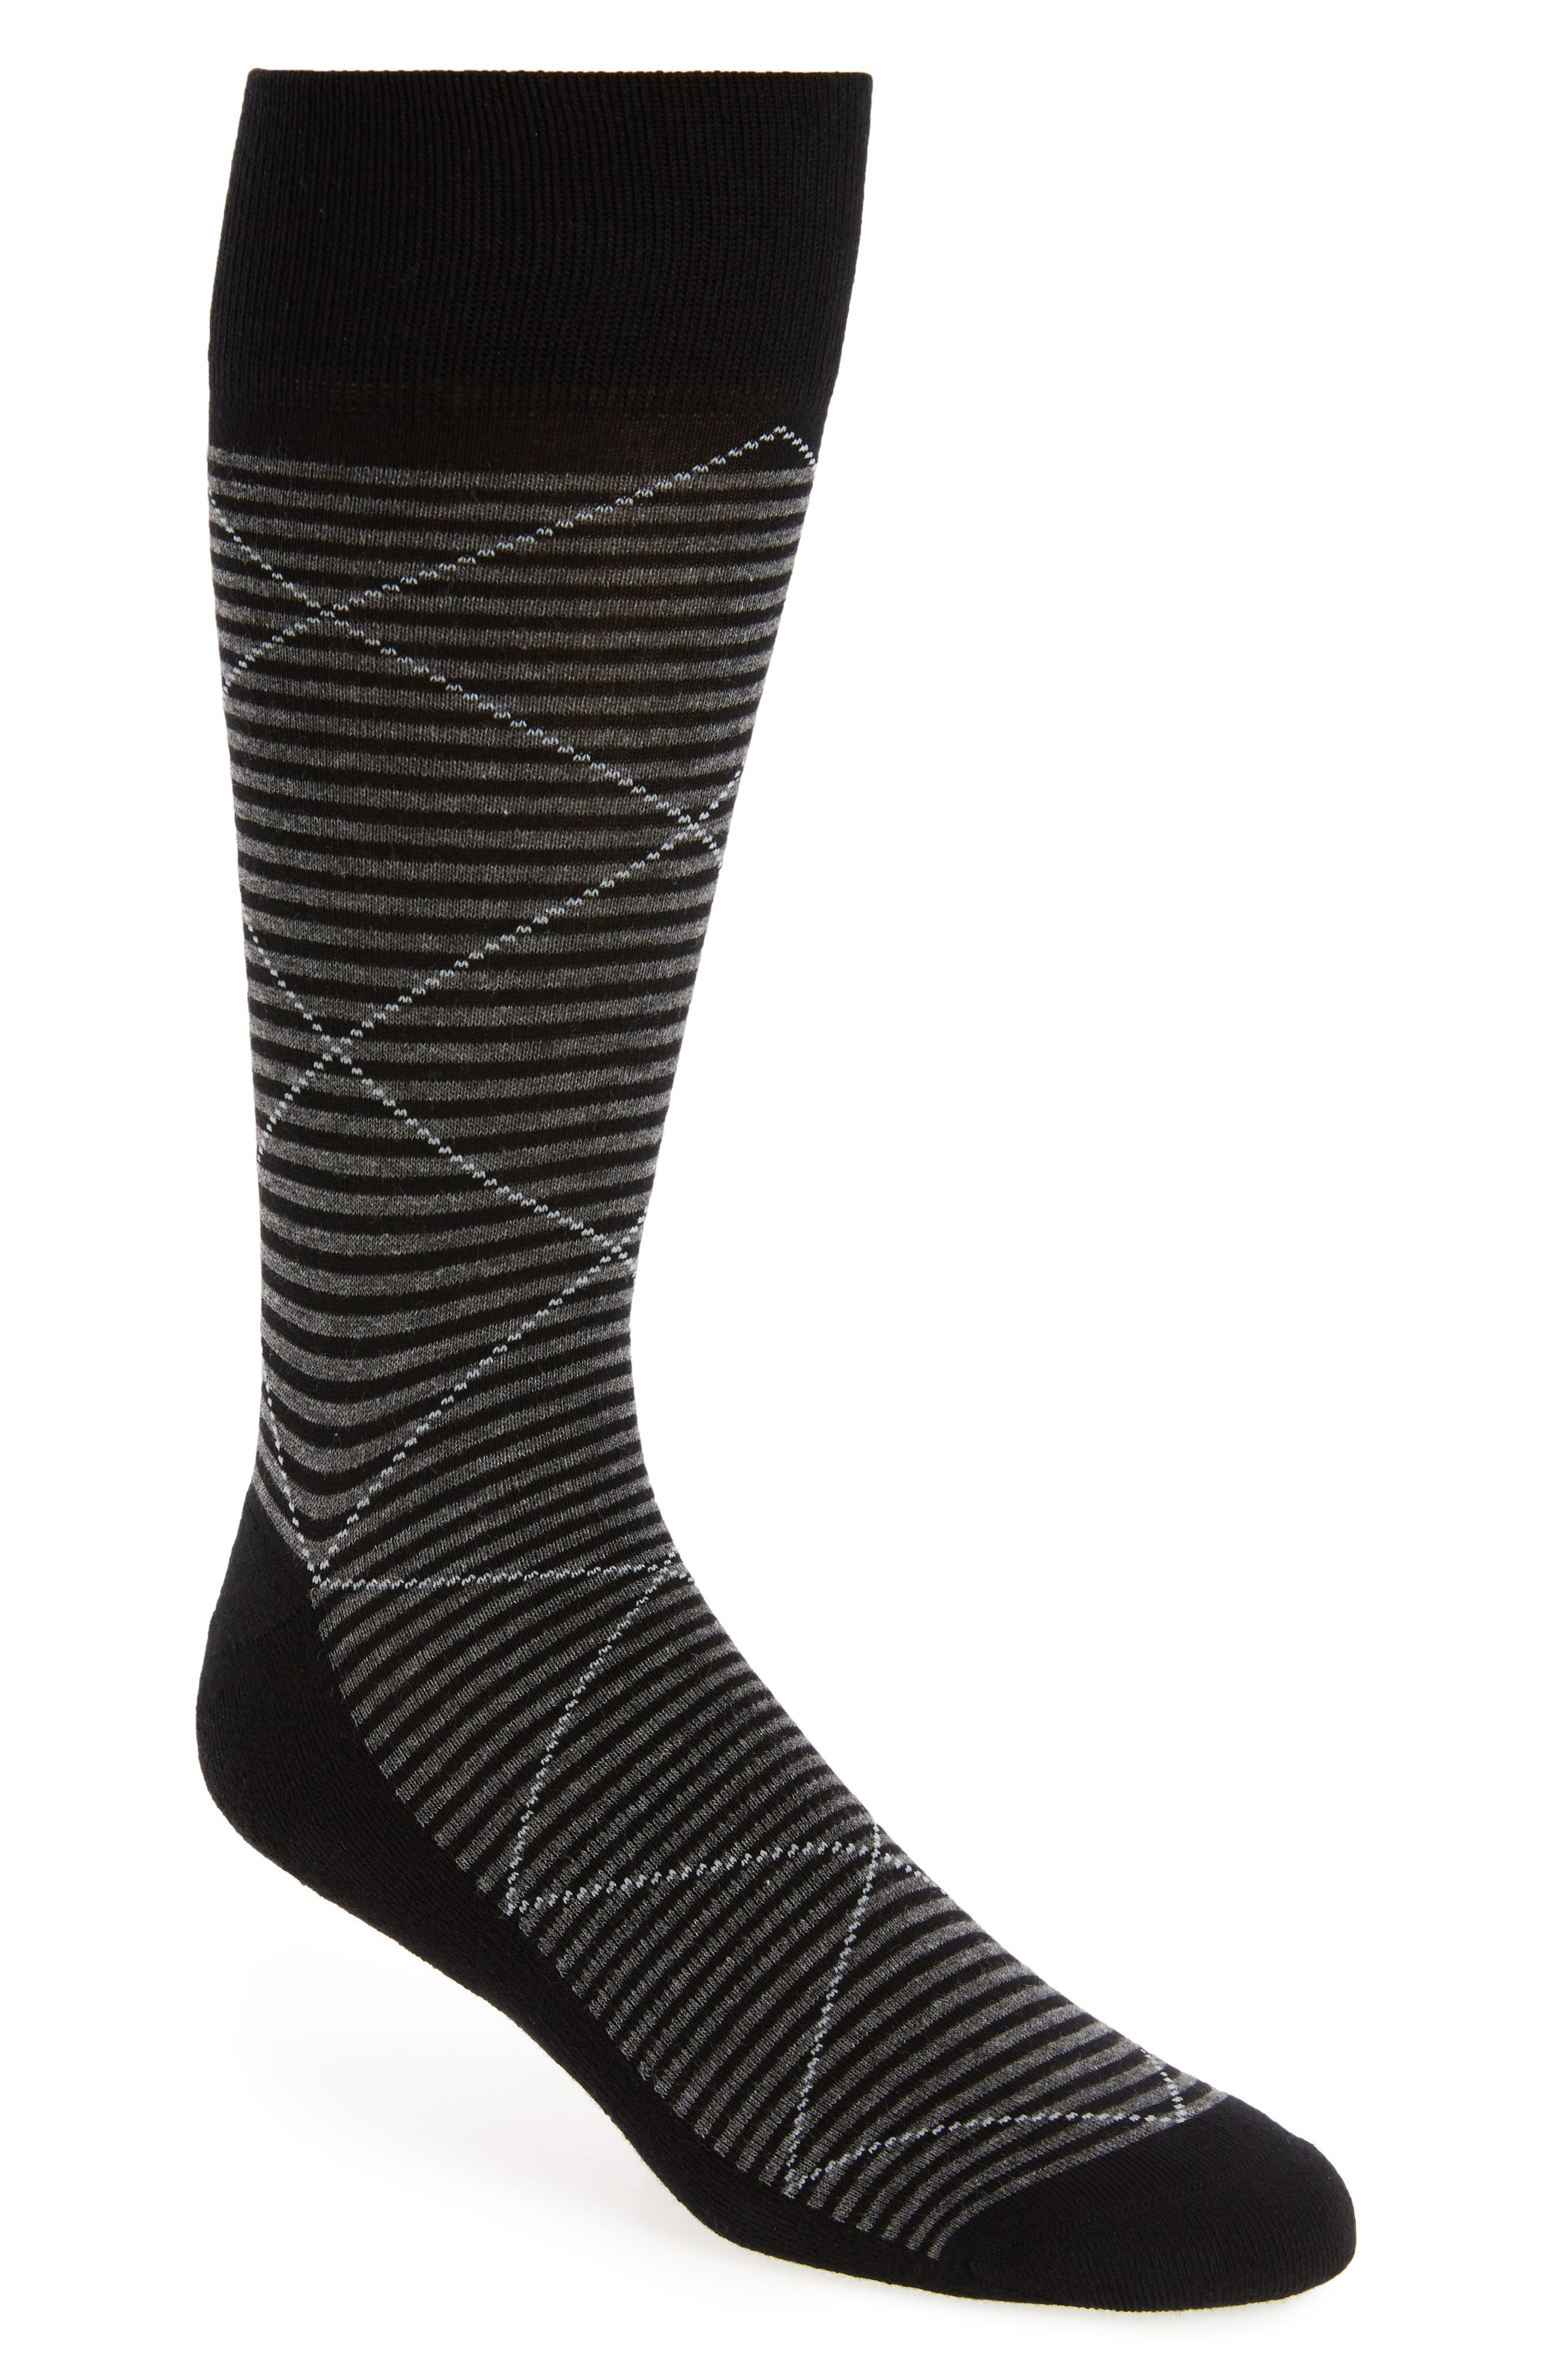 Argyle Socks,                             Main thumbnail 1, color,                             001